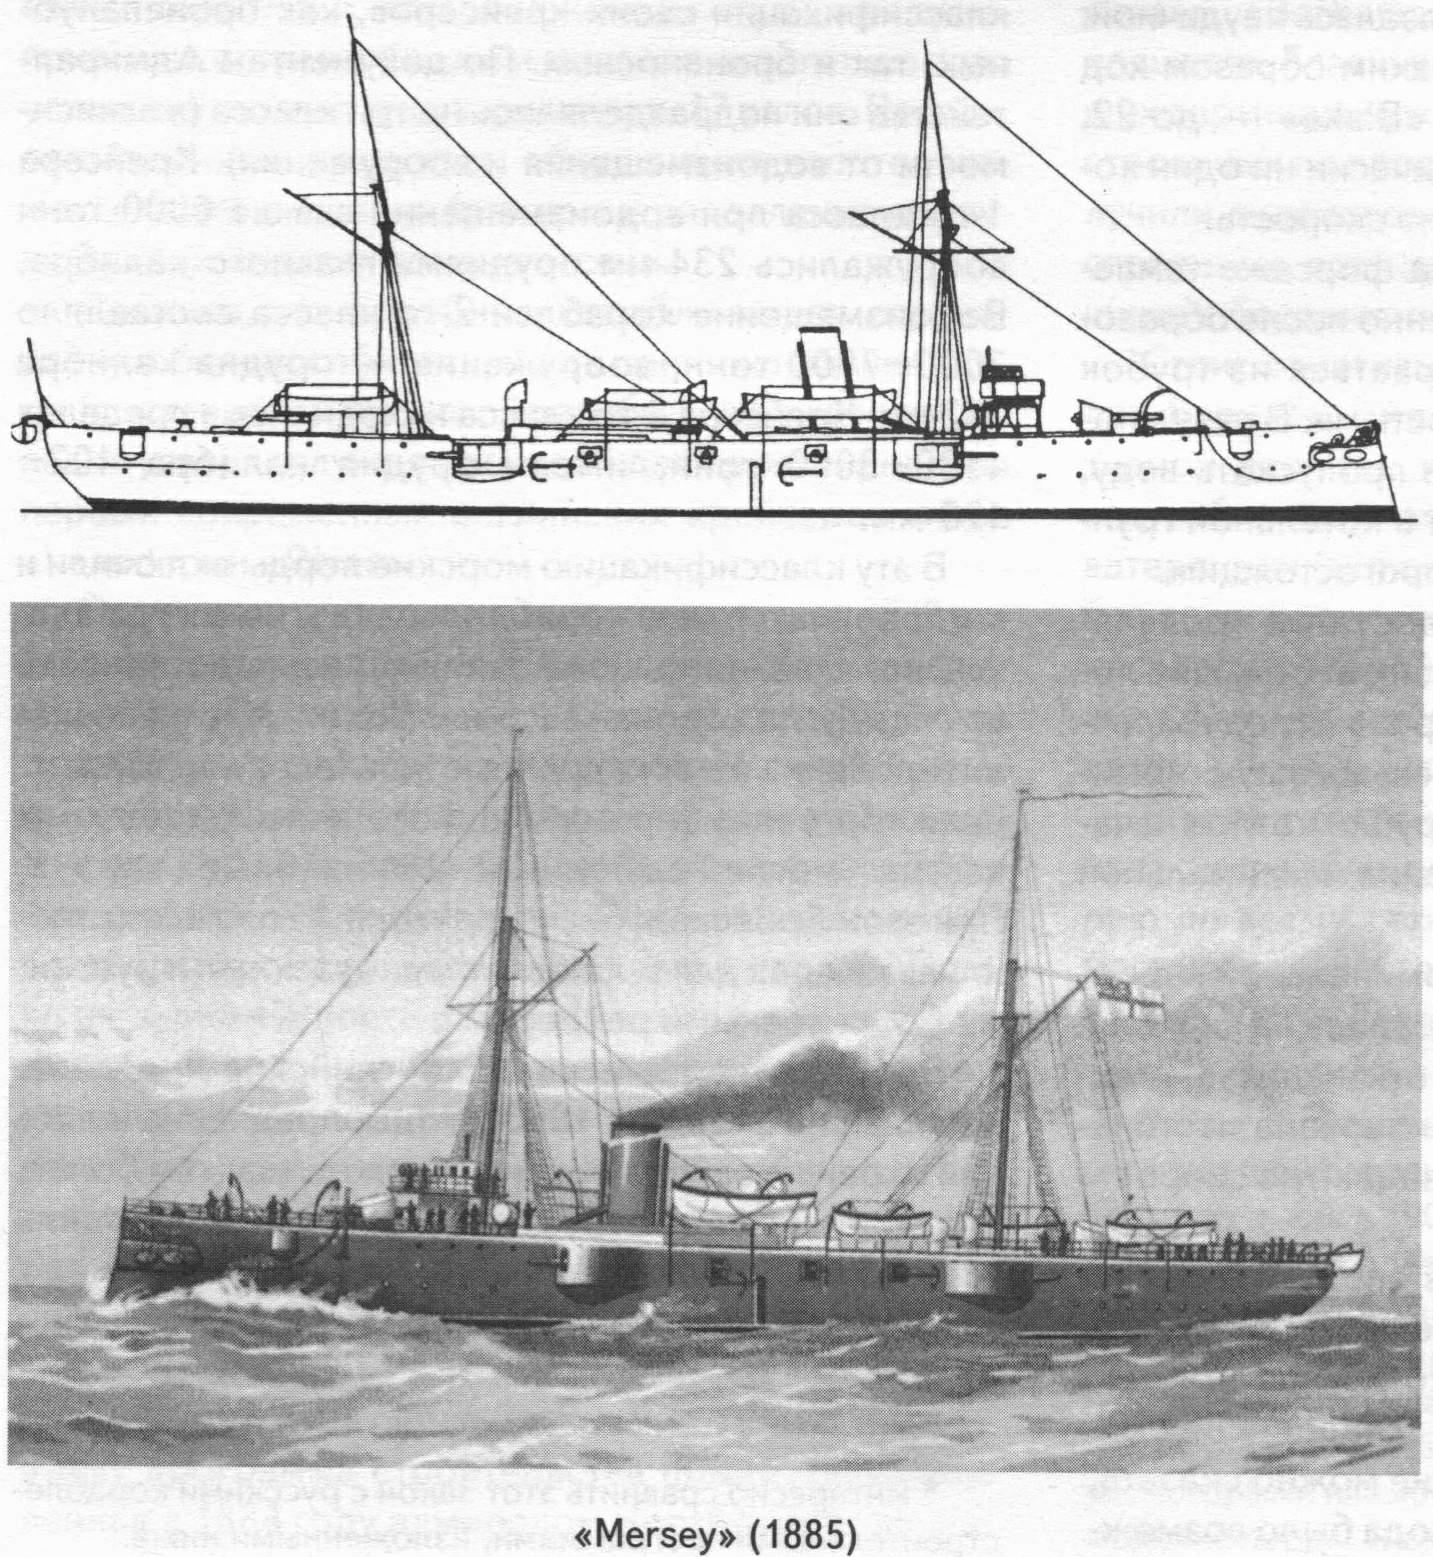 Mersey_1885.jpg